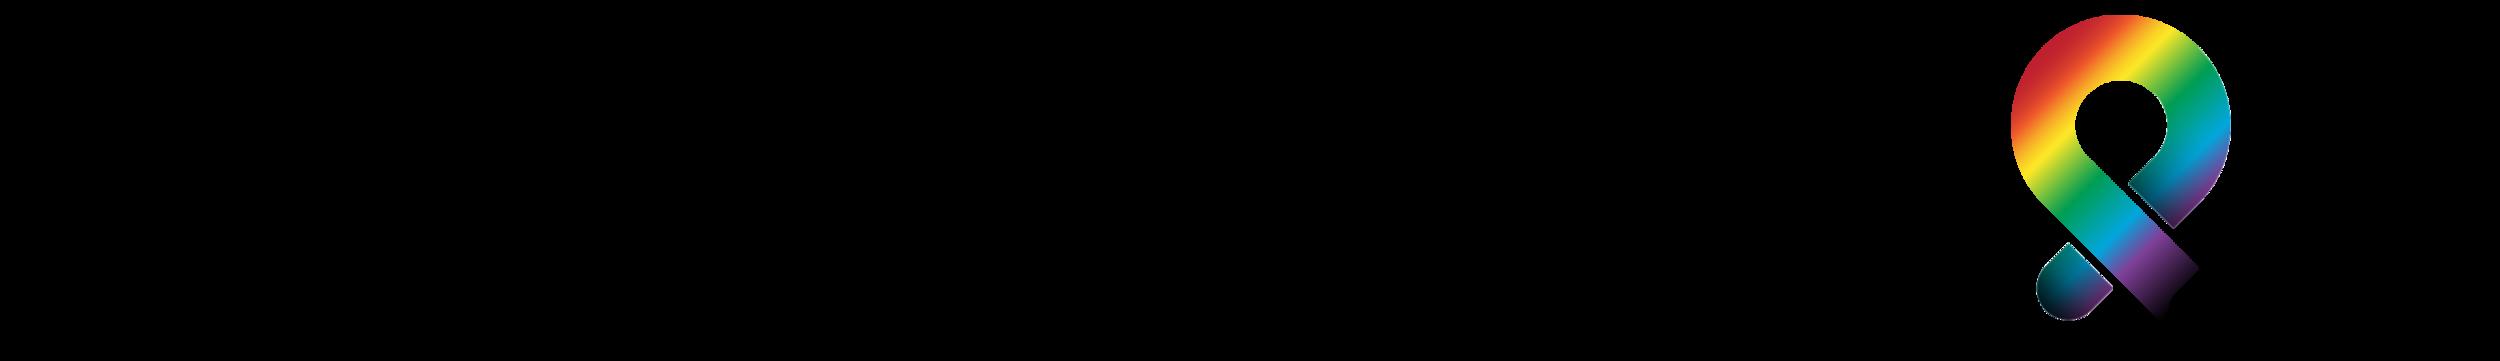 priderunto_PRA_logo_RGB_01-clear.png